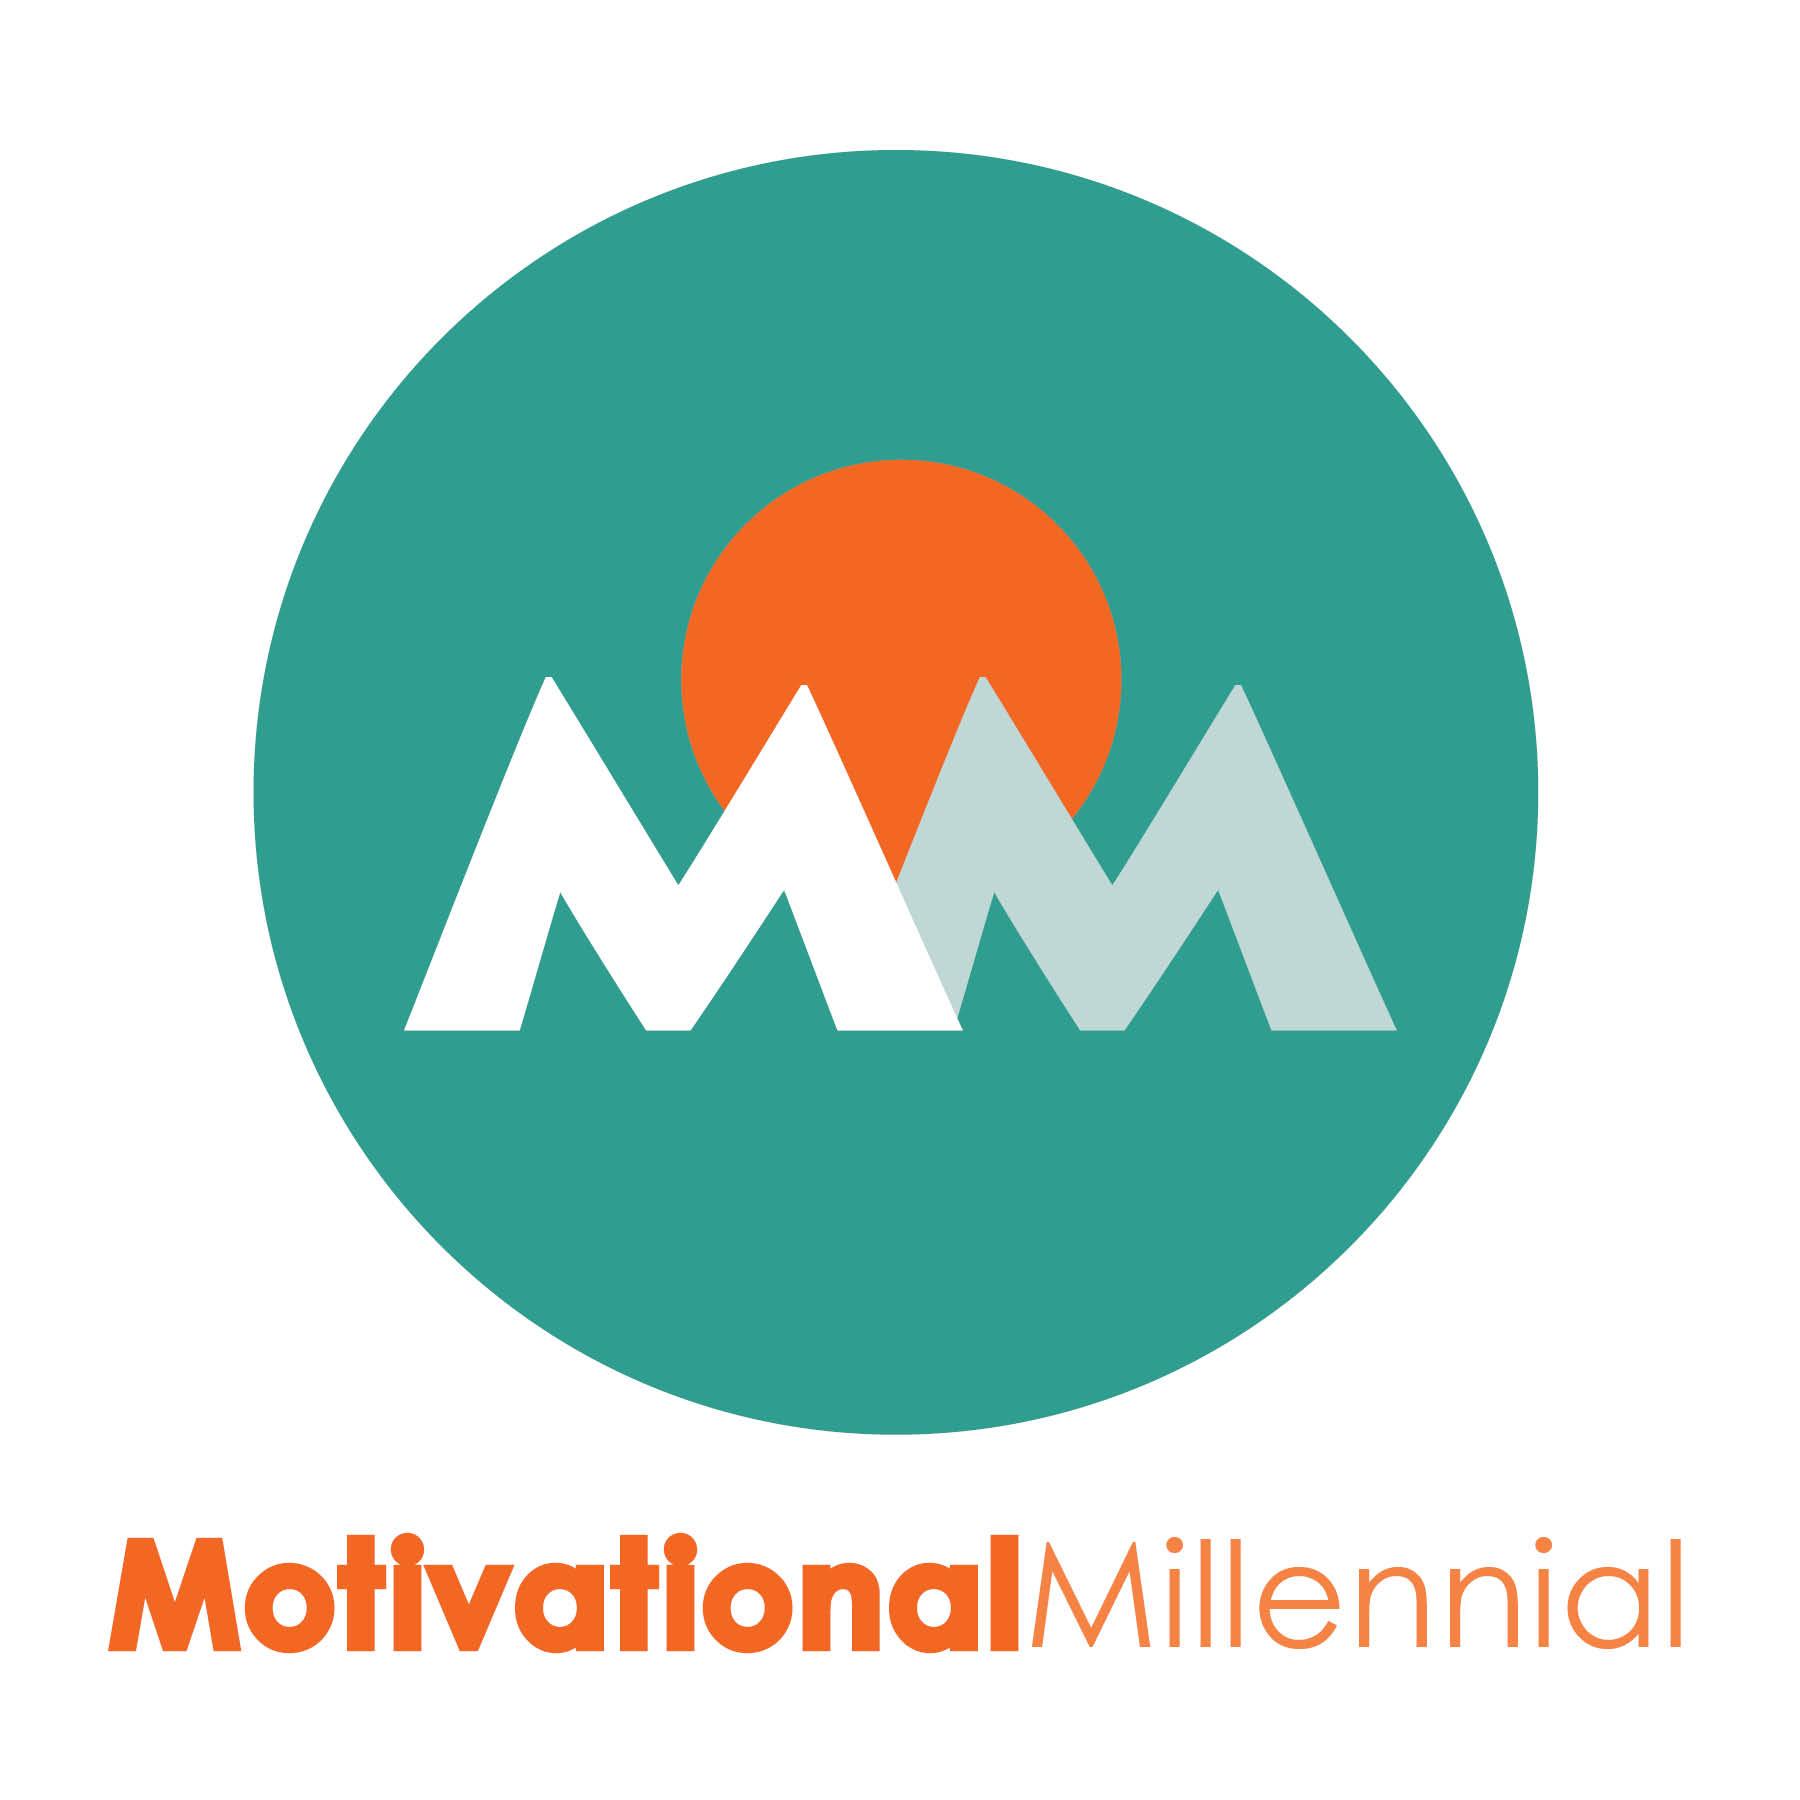 MM logo jpeg.jpg